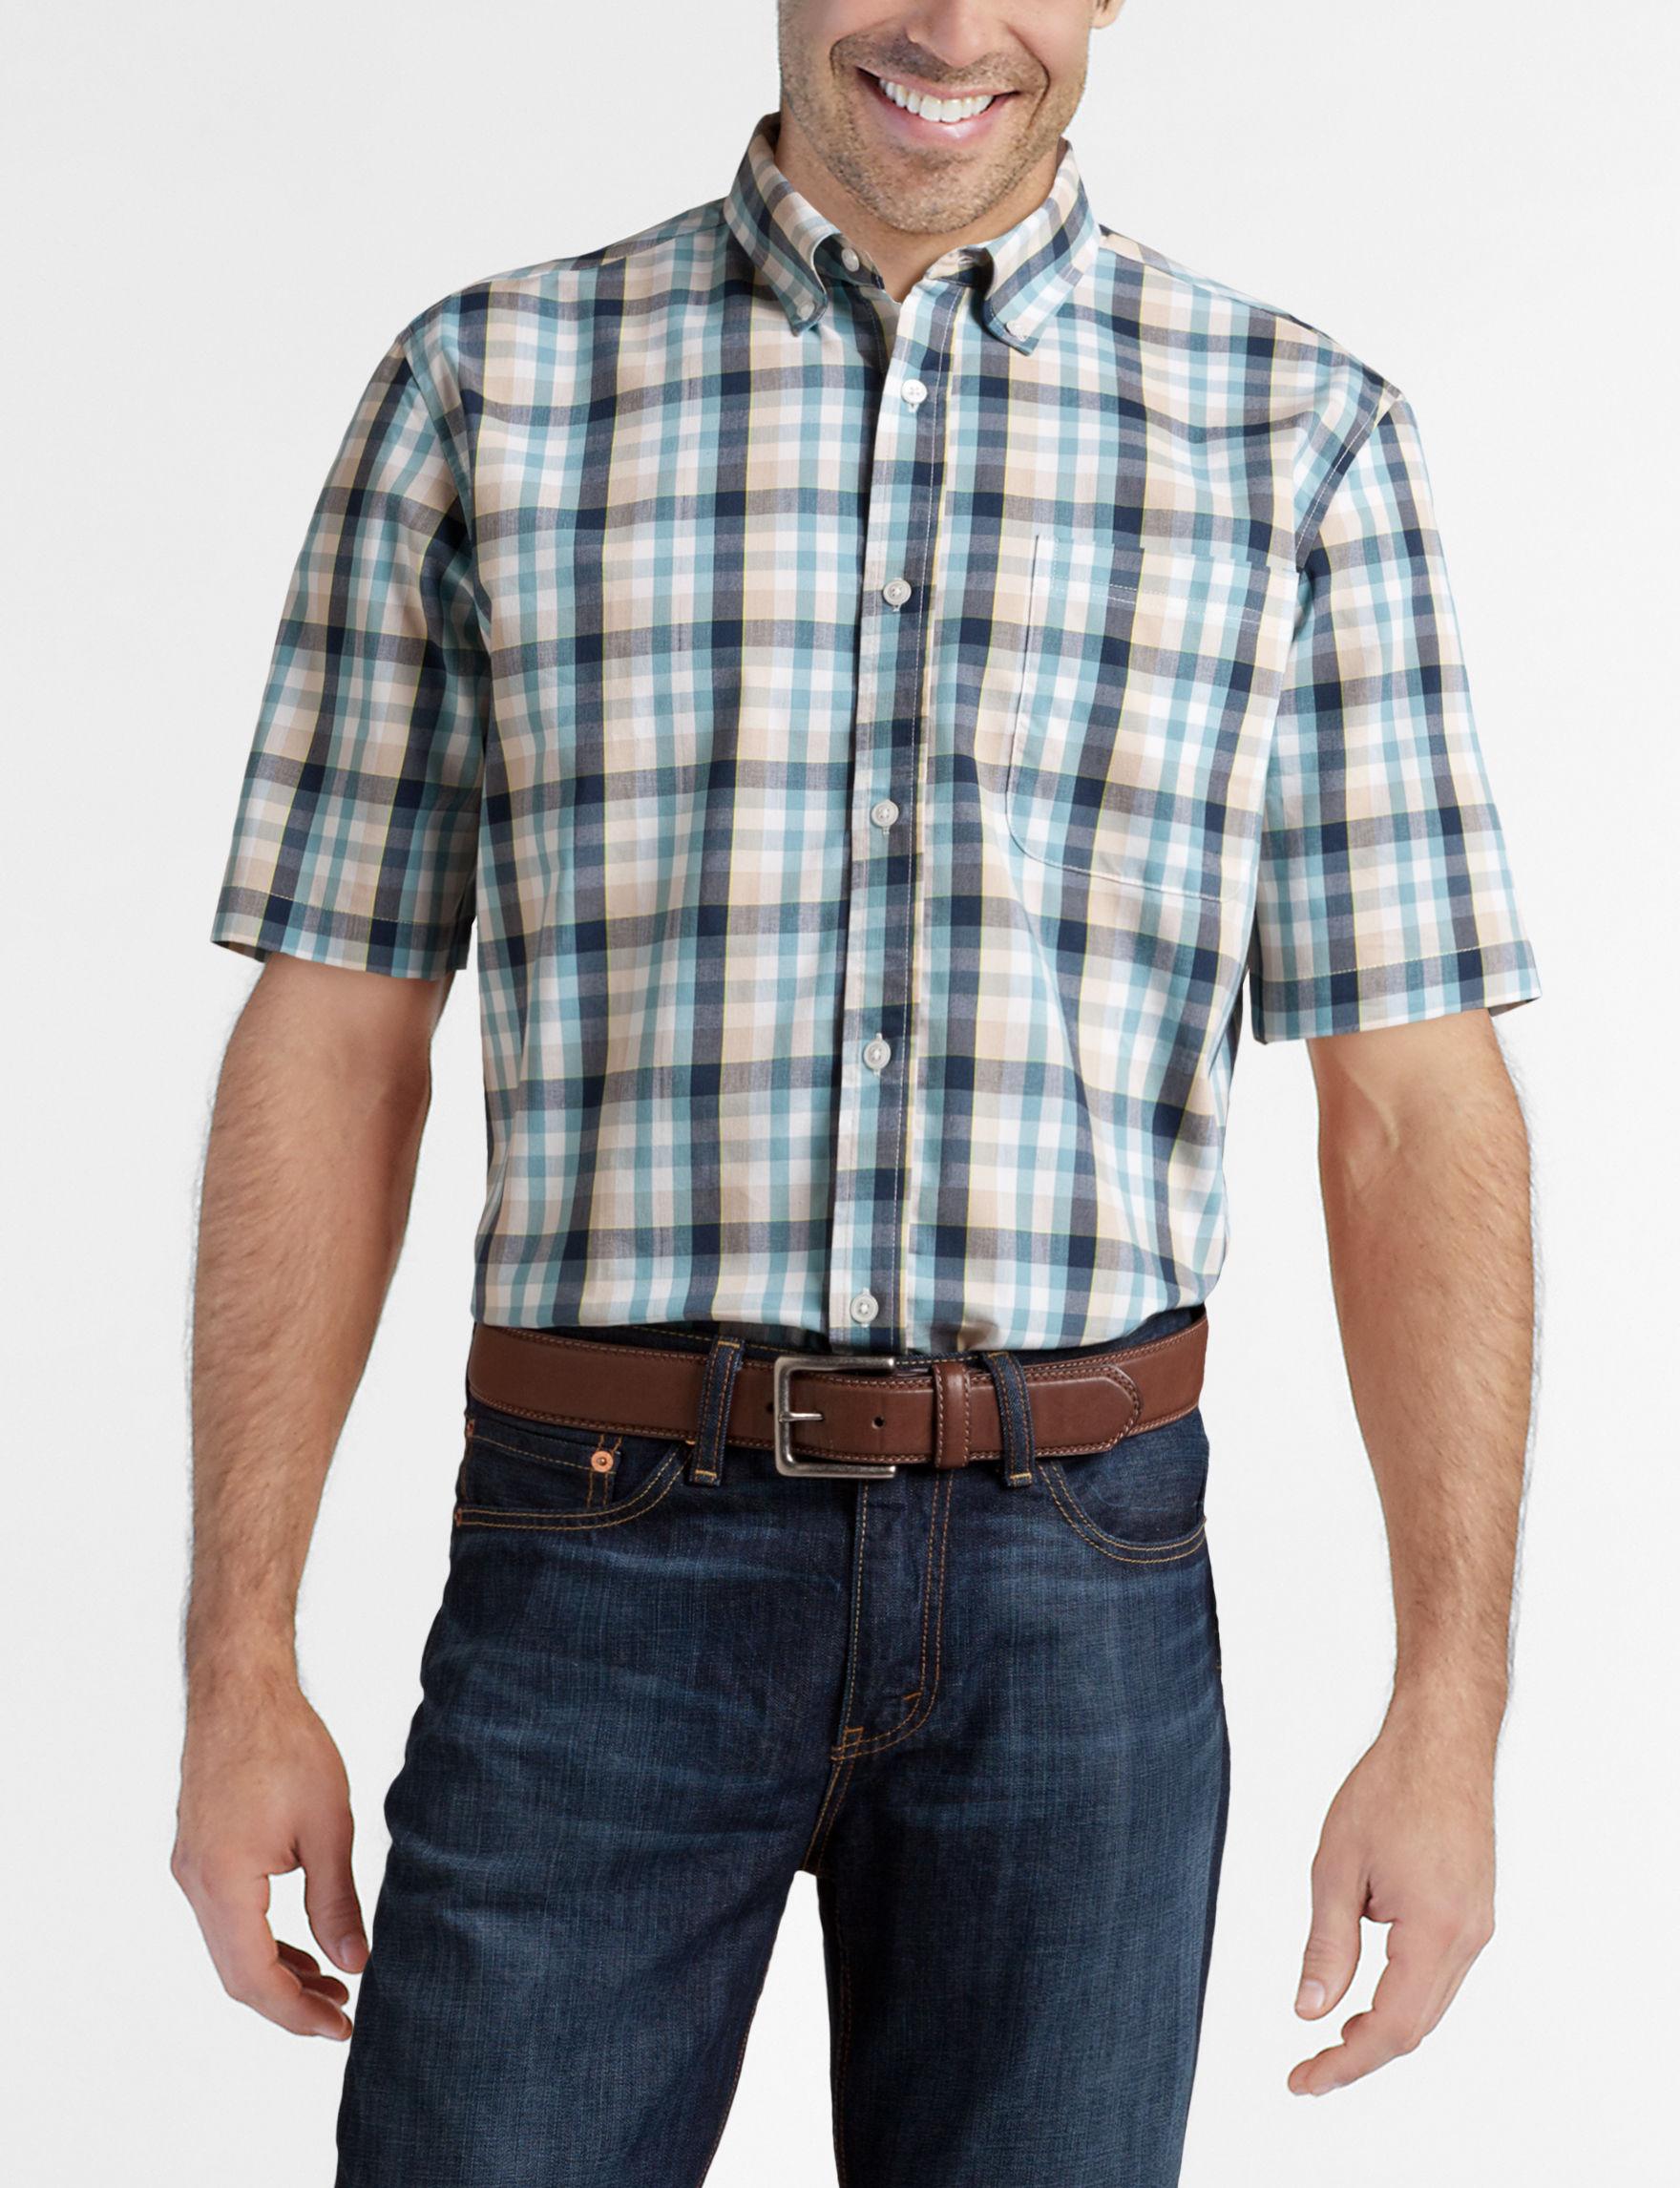 Sun River Stone Casual Button Down Shirts